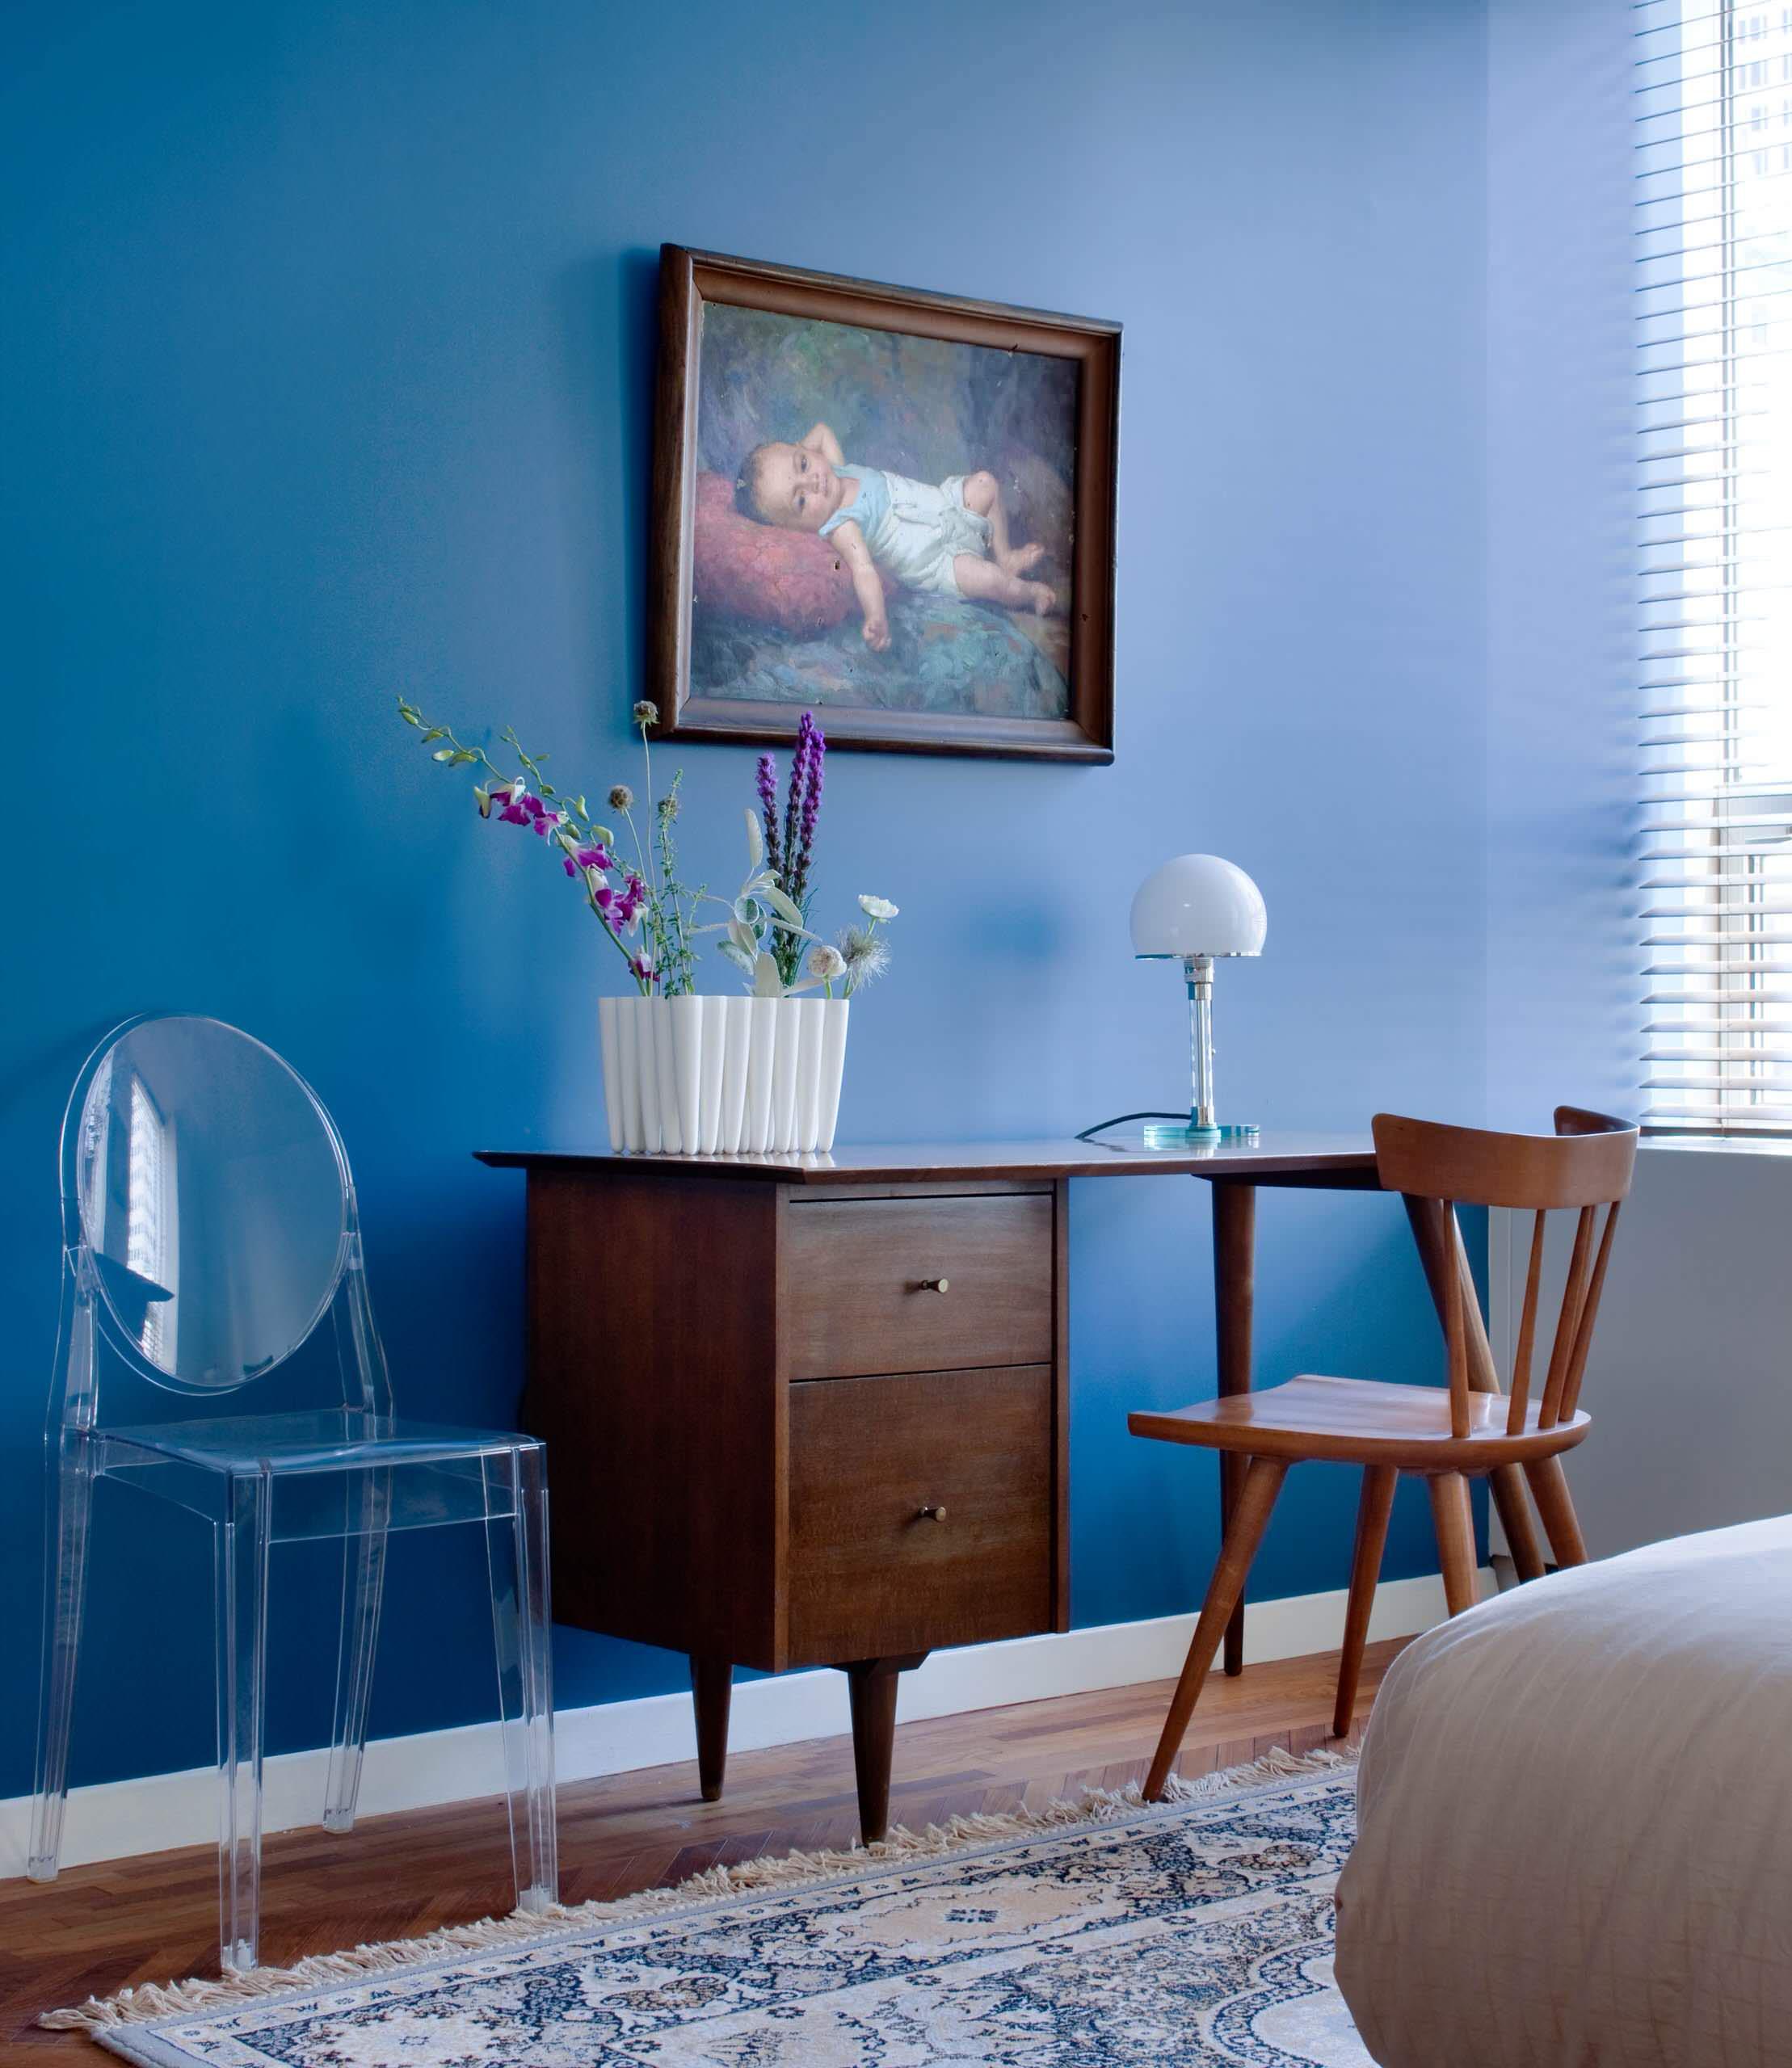 Modern Computer Desk Bedroom Ideas And Photos Houzz